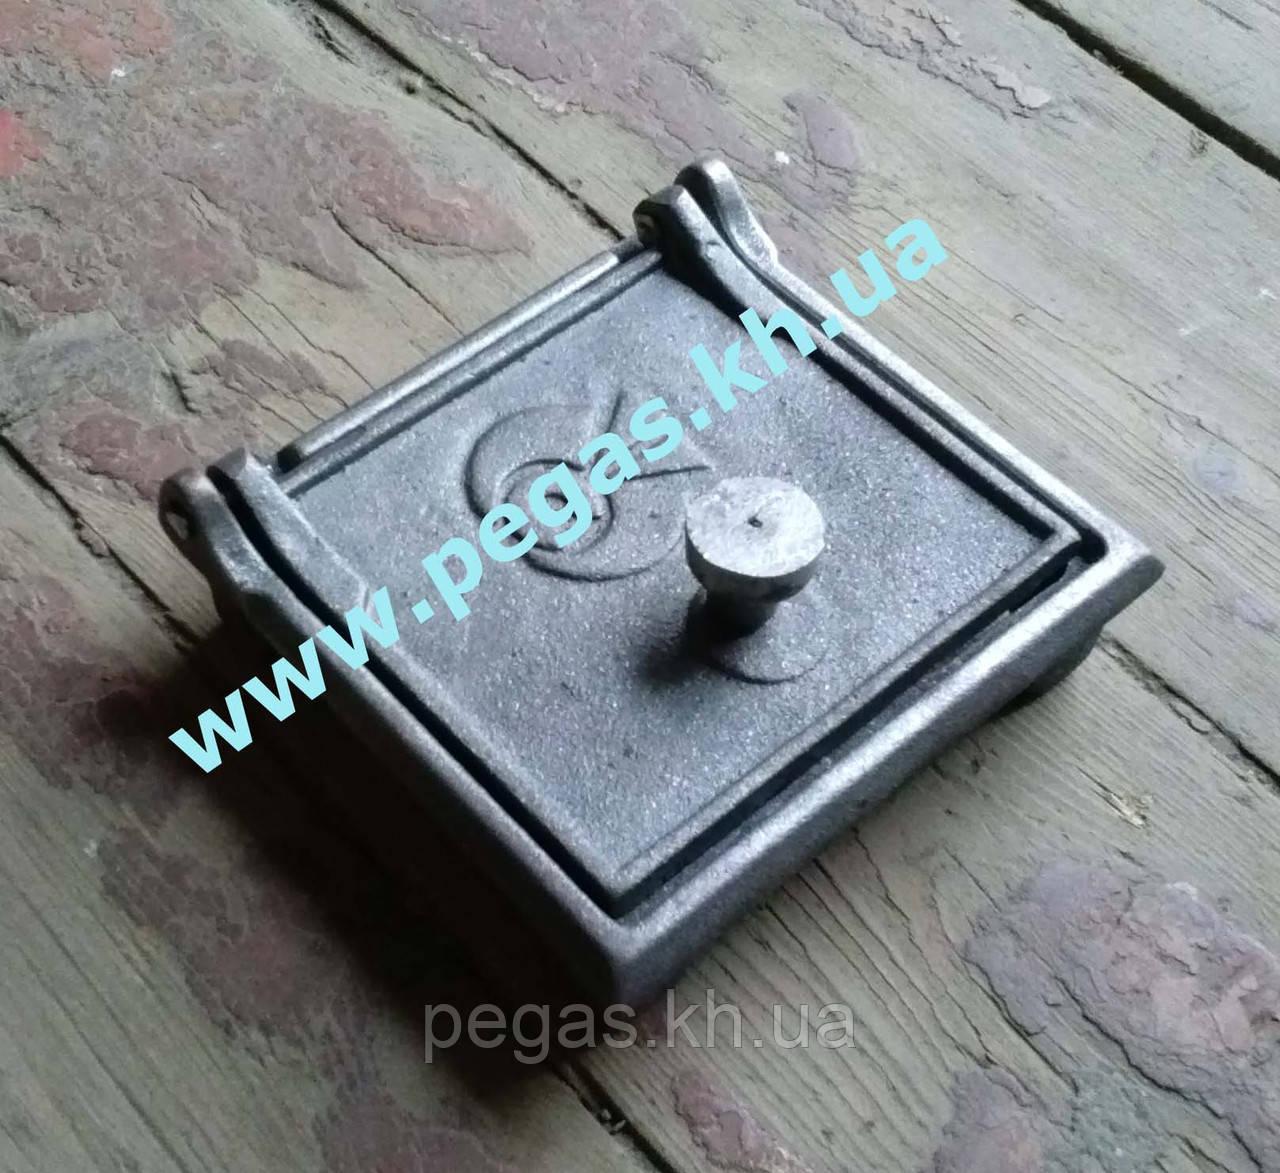 Дверка печная сажетруска (150х160 мм) сажечистка, люк для золы